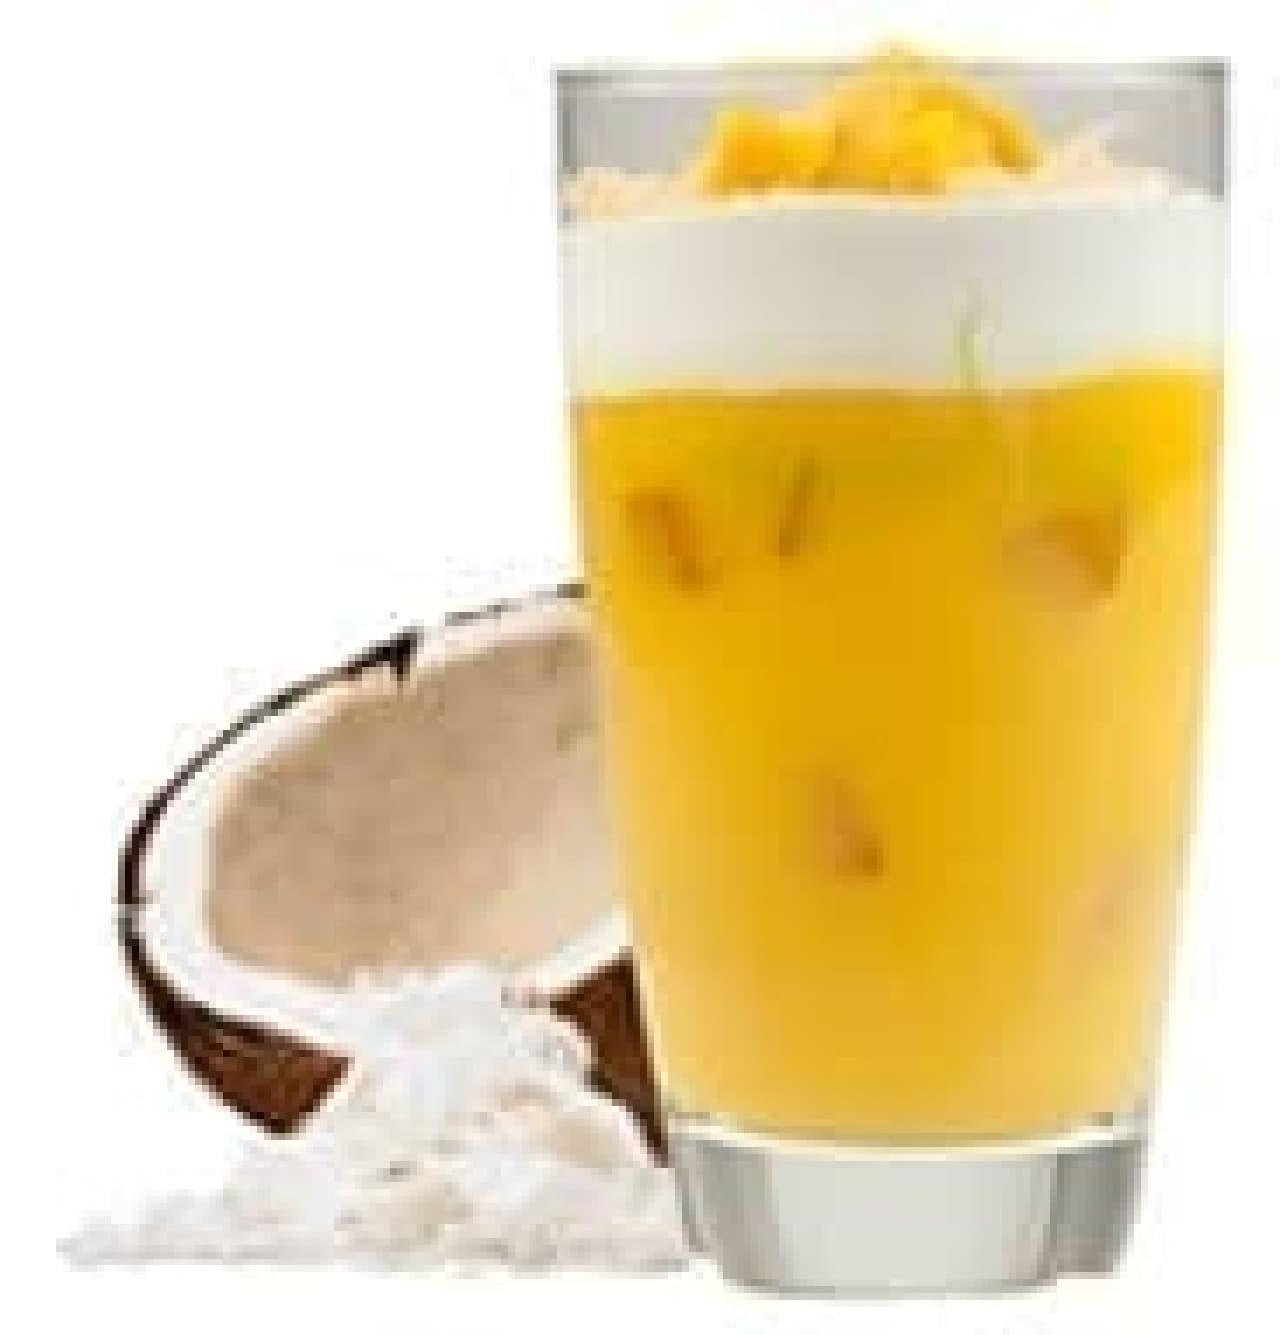 CAFE MANGOSIX(カフェ・マンゴーシックス) マンゴー&ココナッツジュース